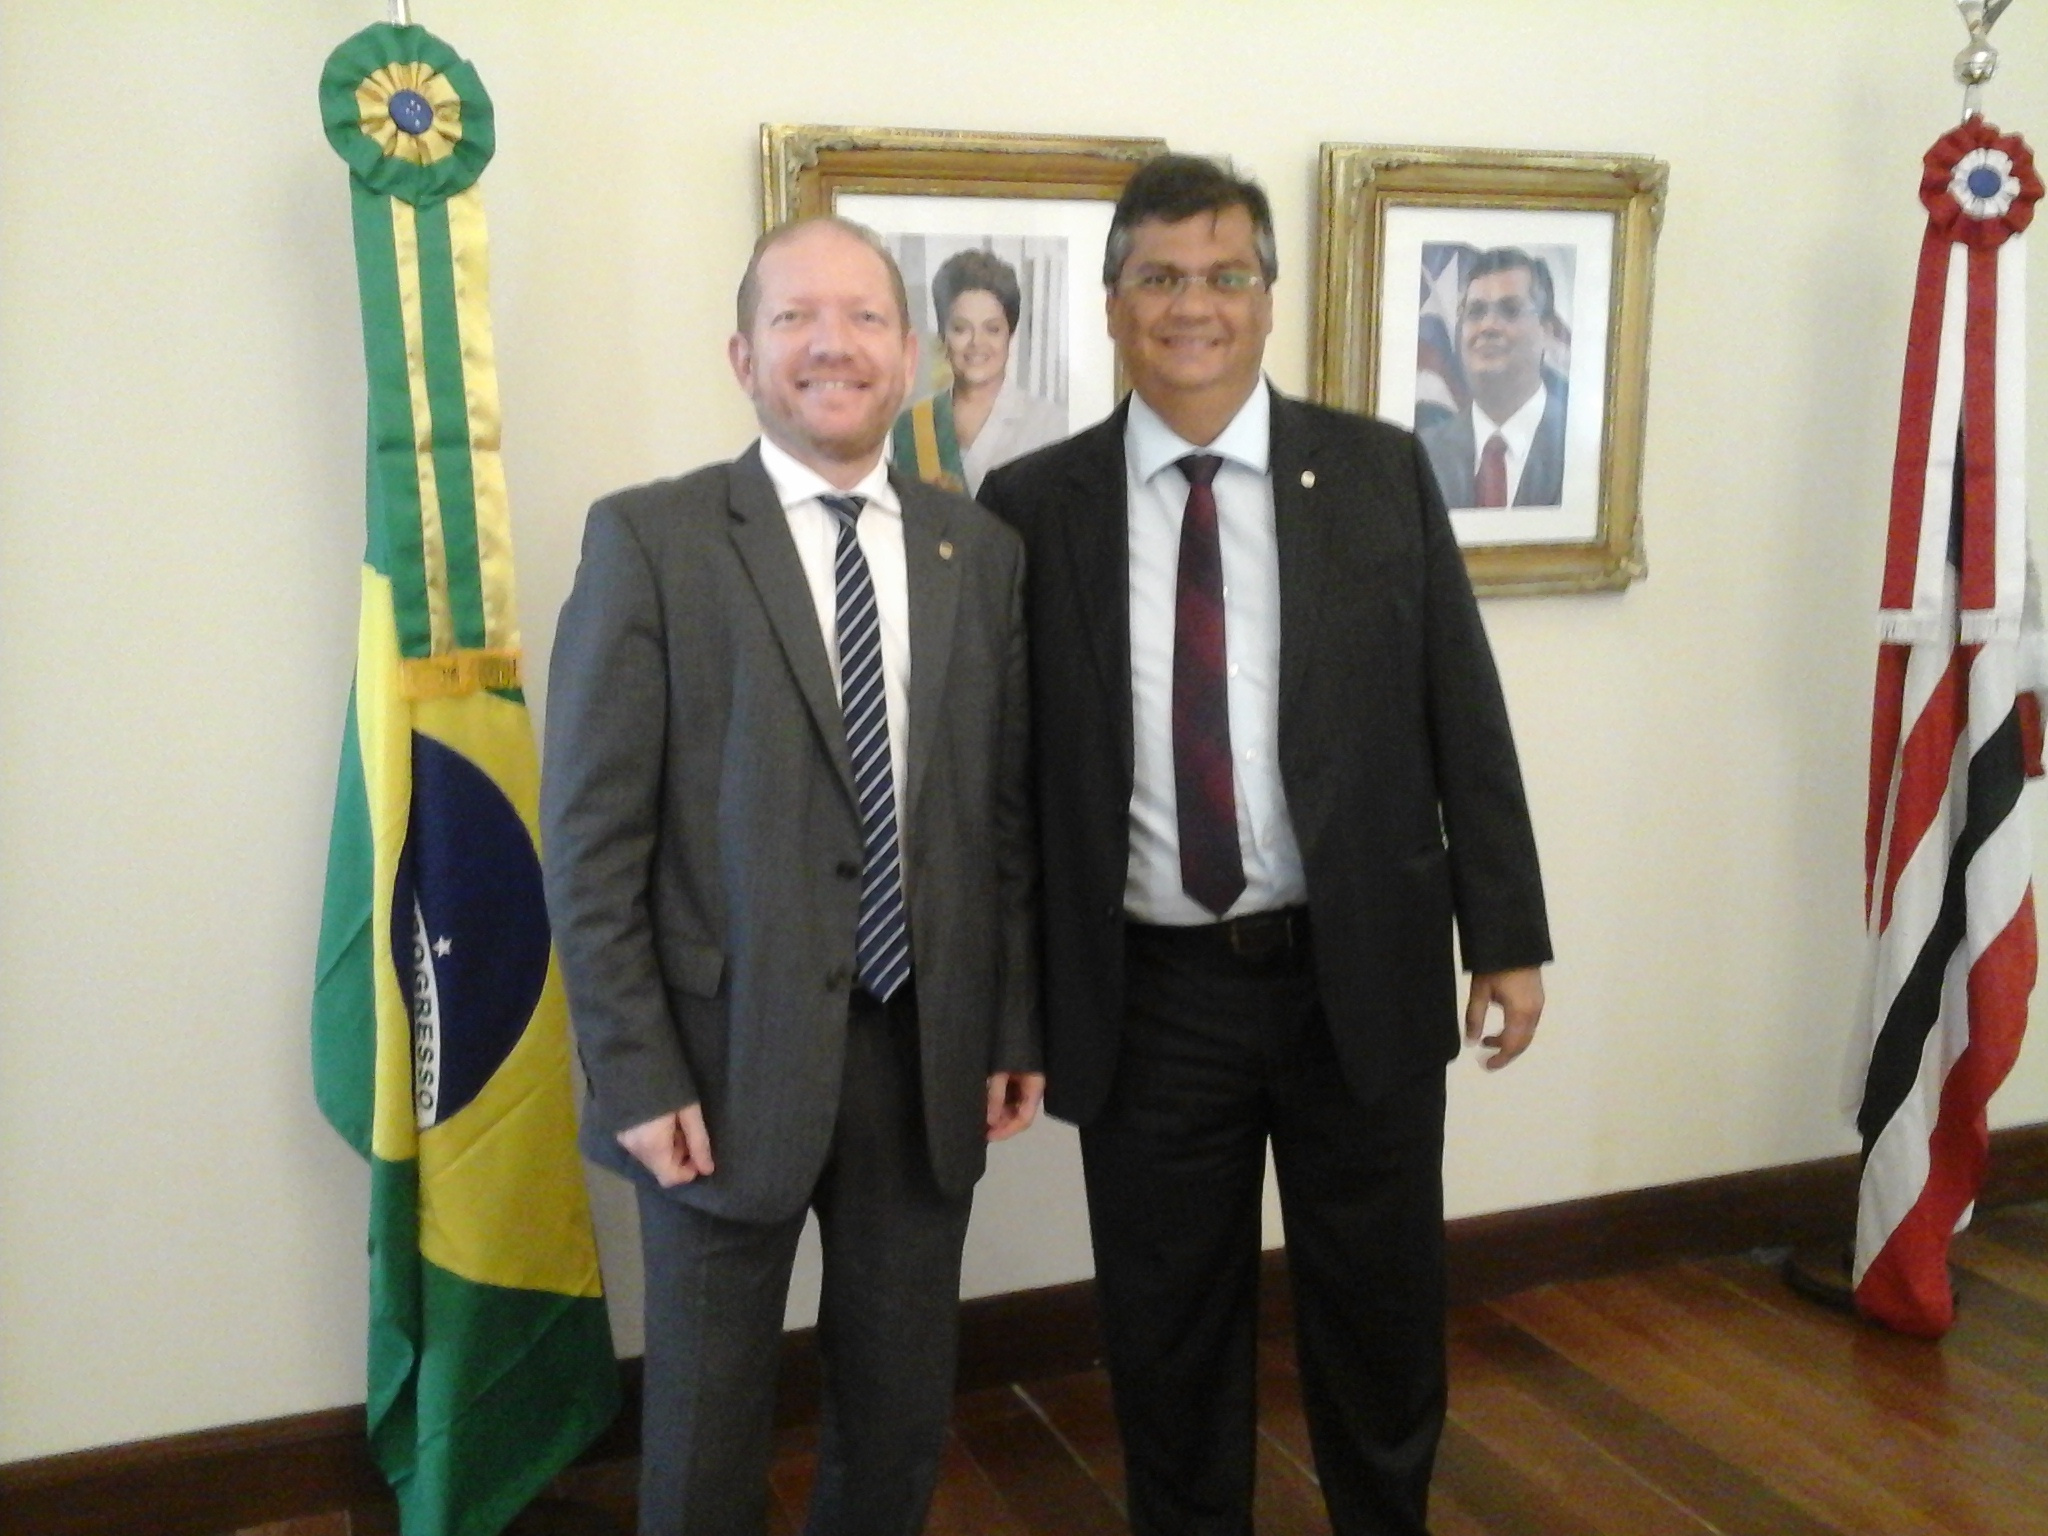 Othelino Neto e o governador Flávio Dino